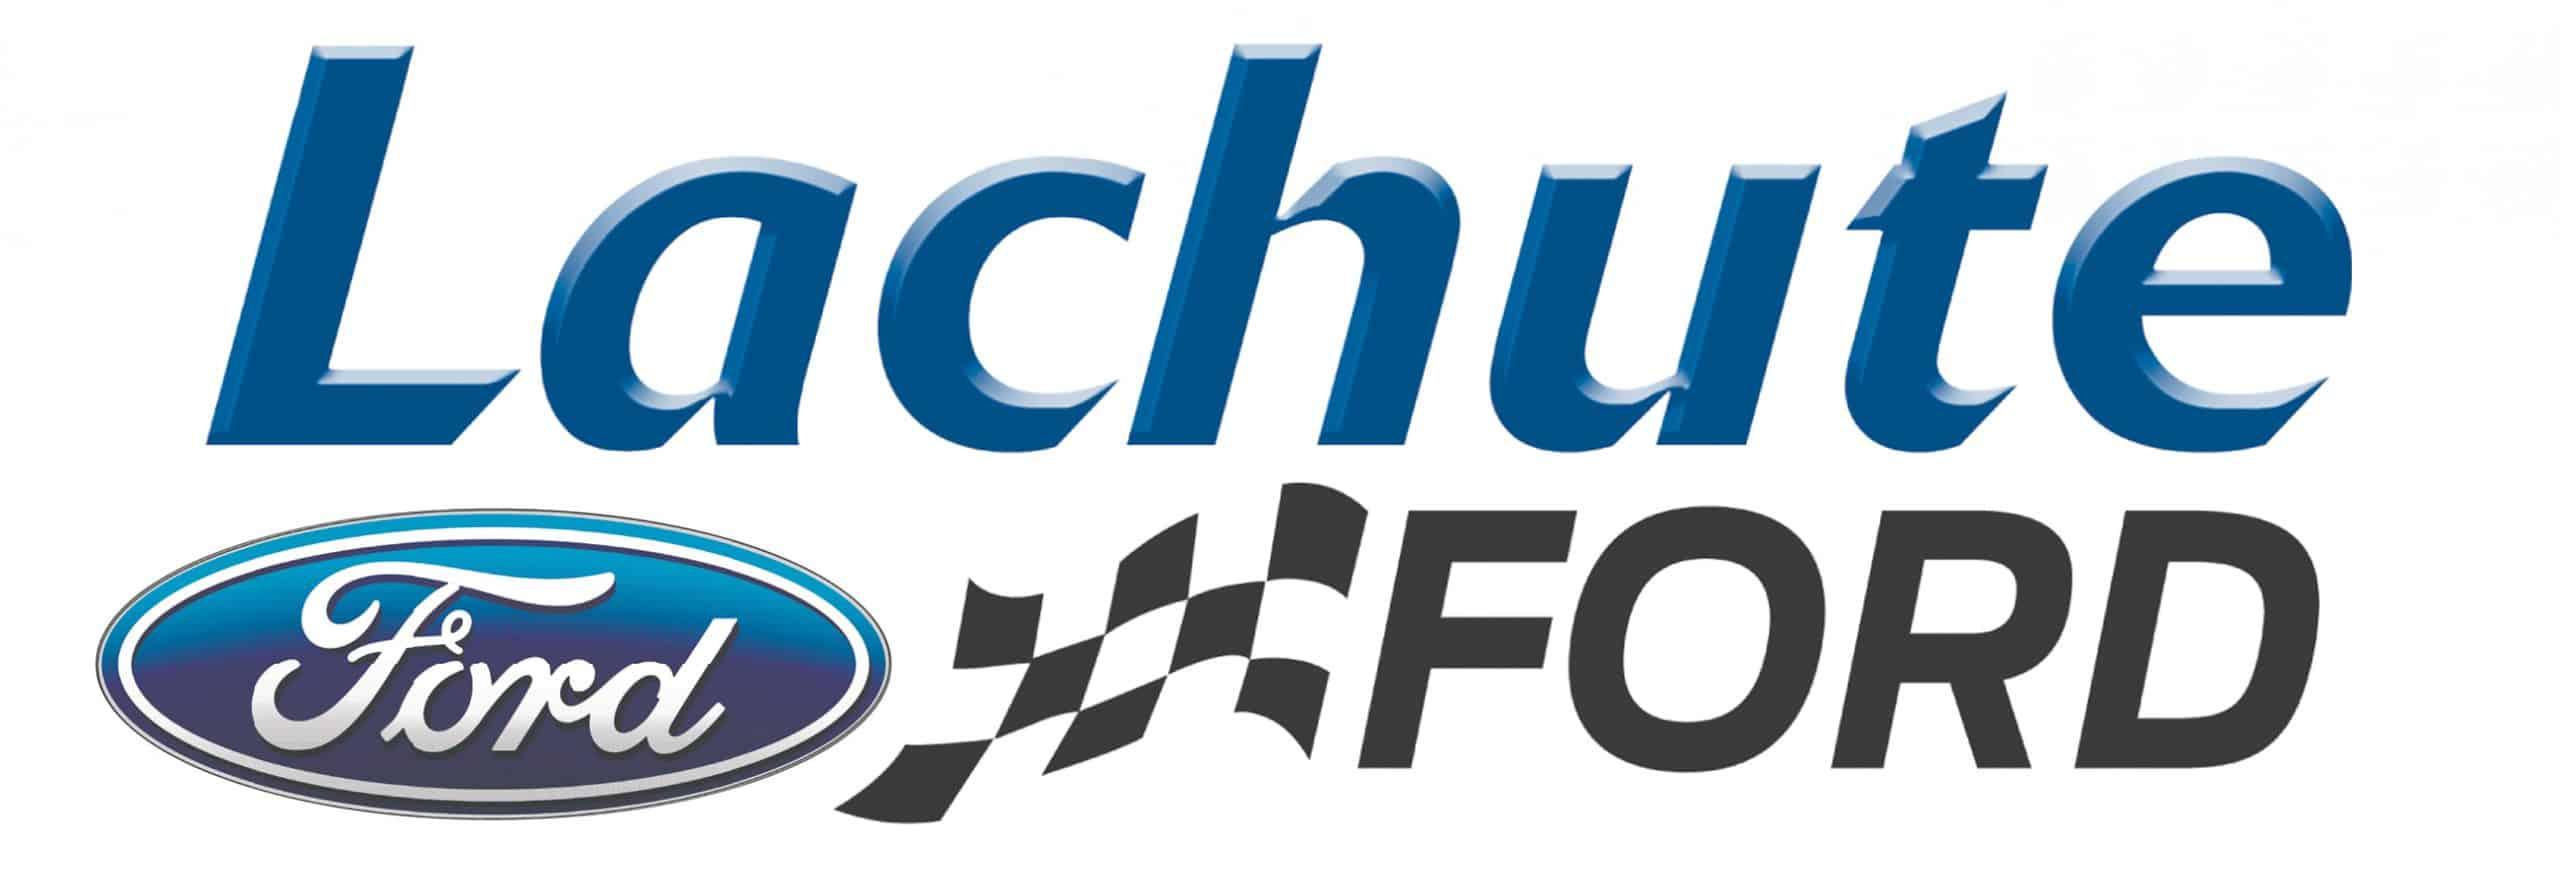 logo-ford-3-2019